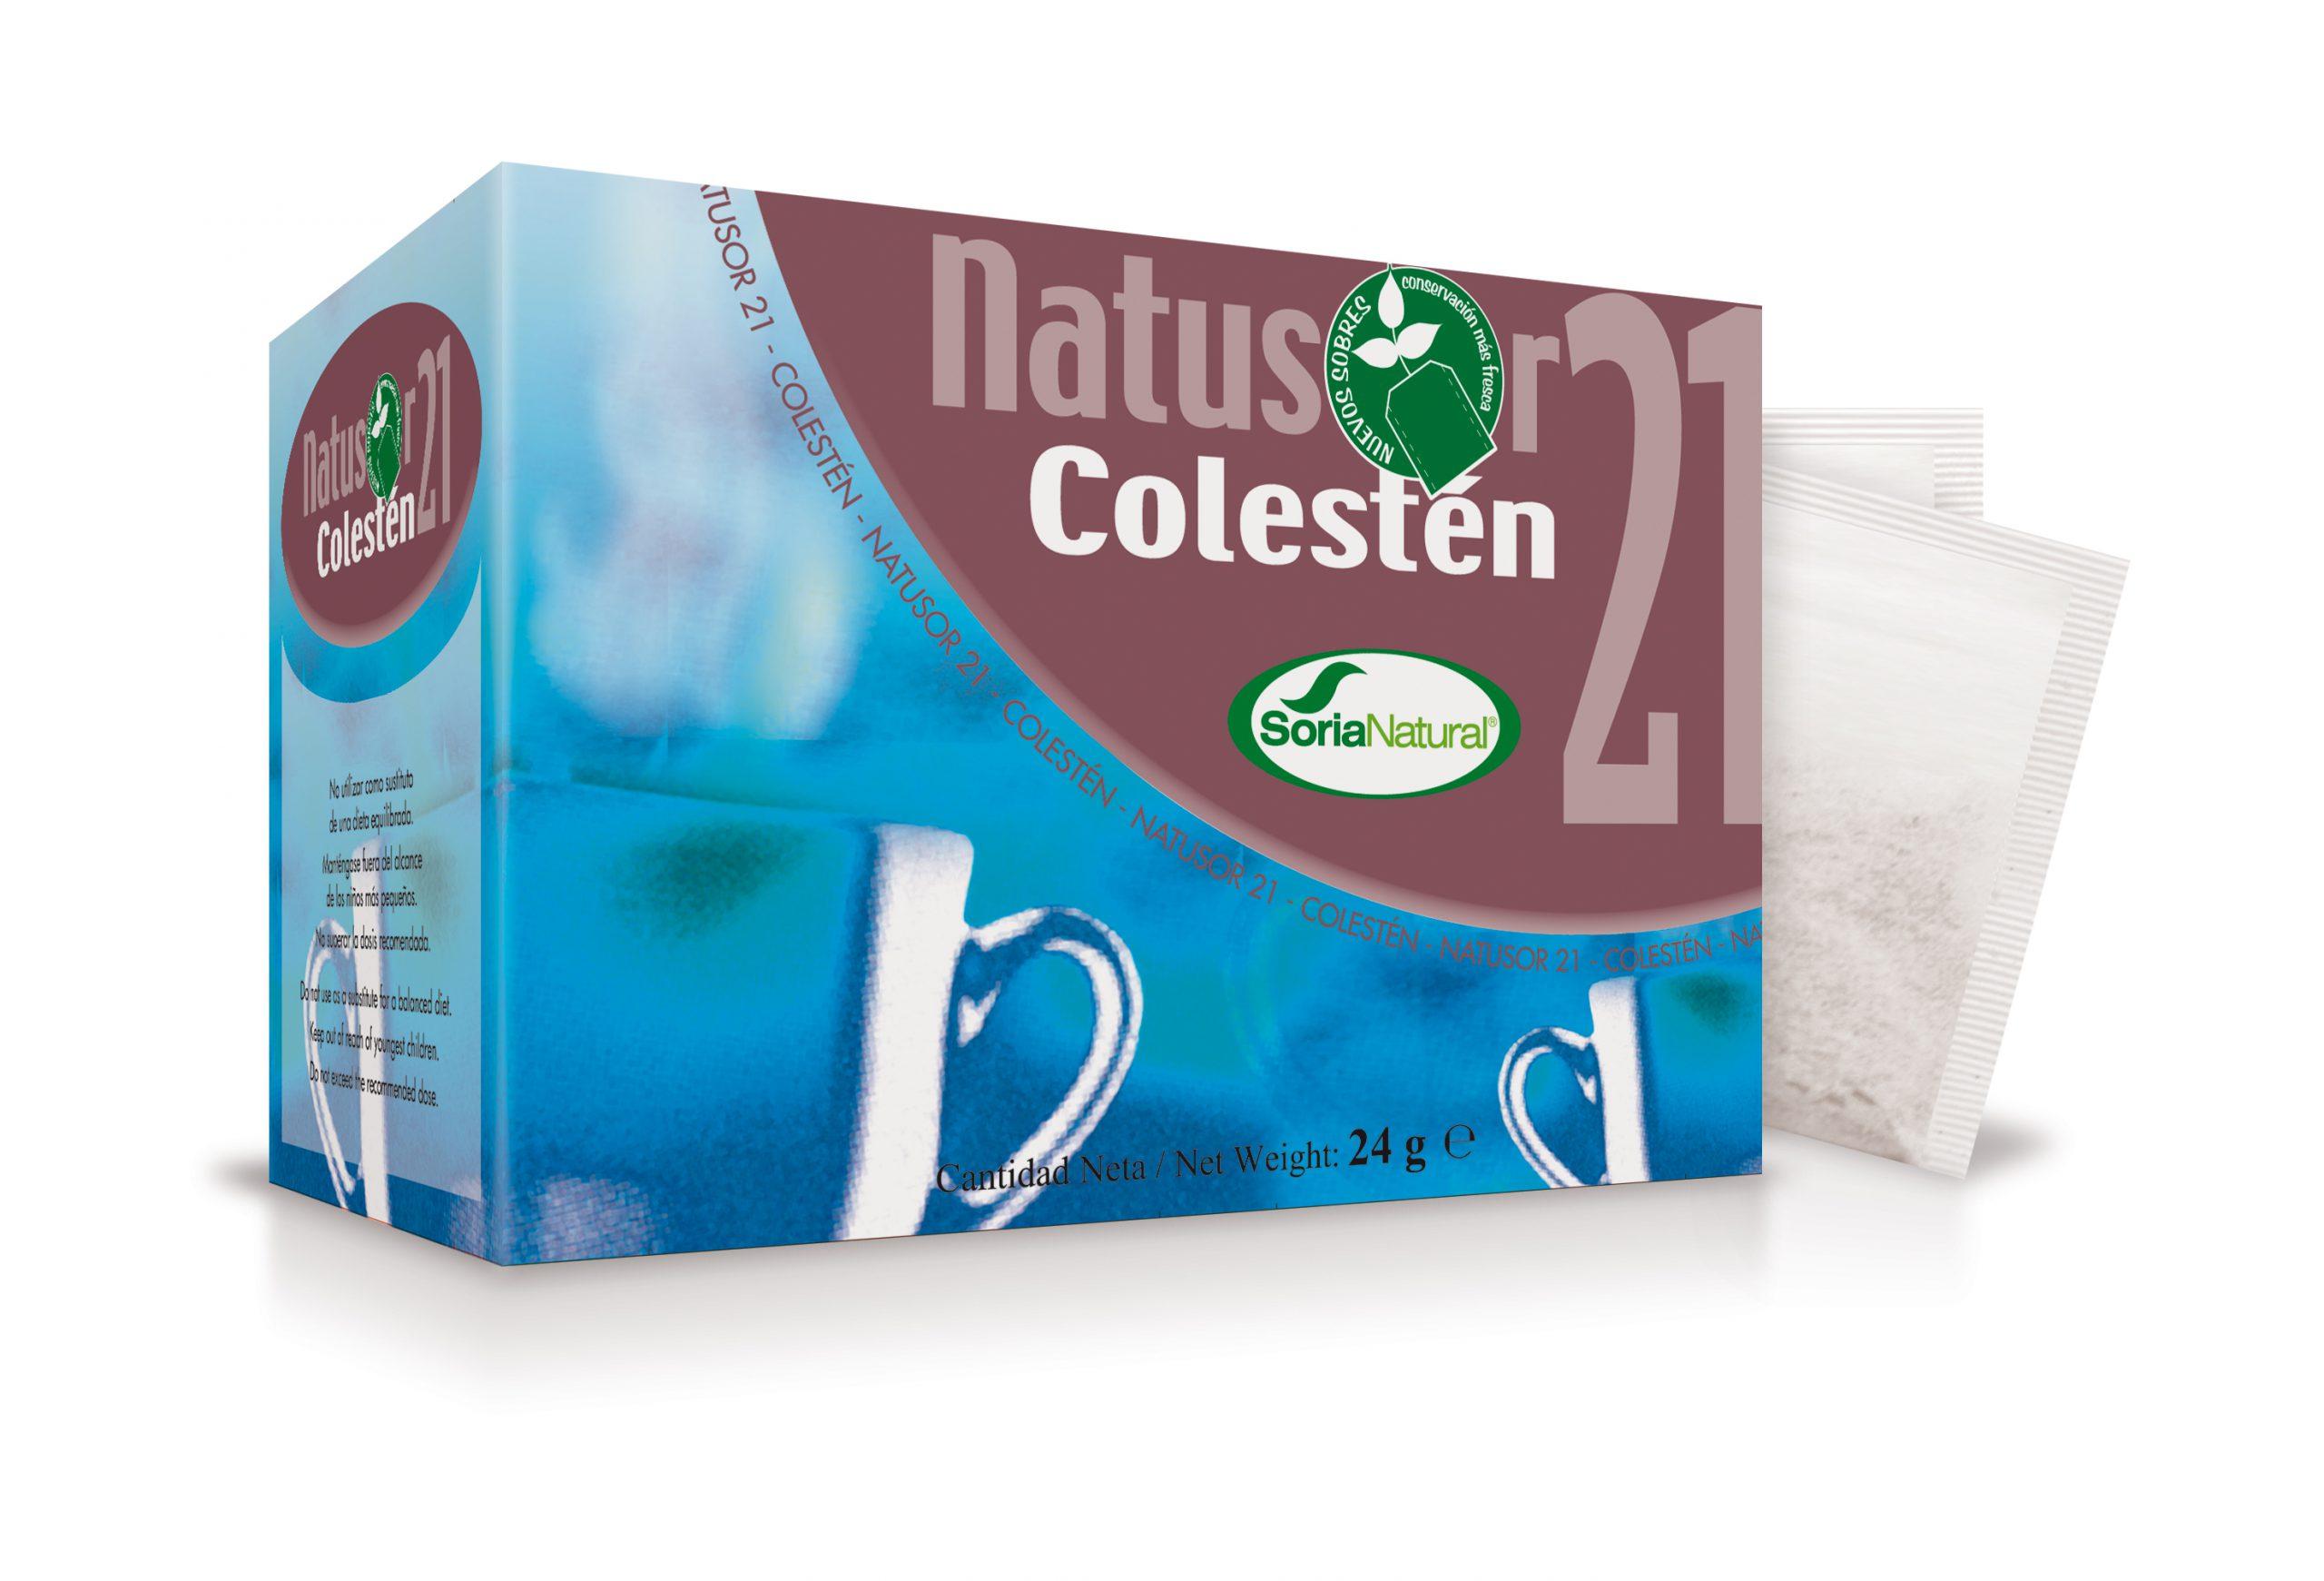 Natusor 21 Colestane